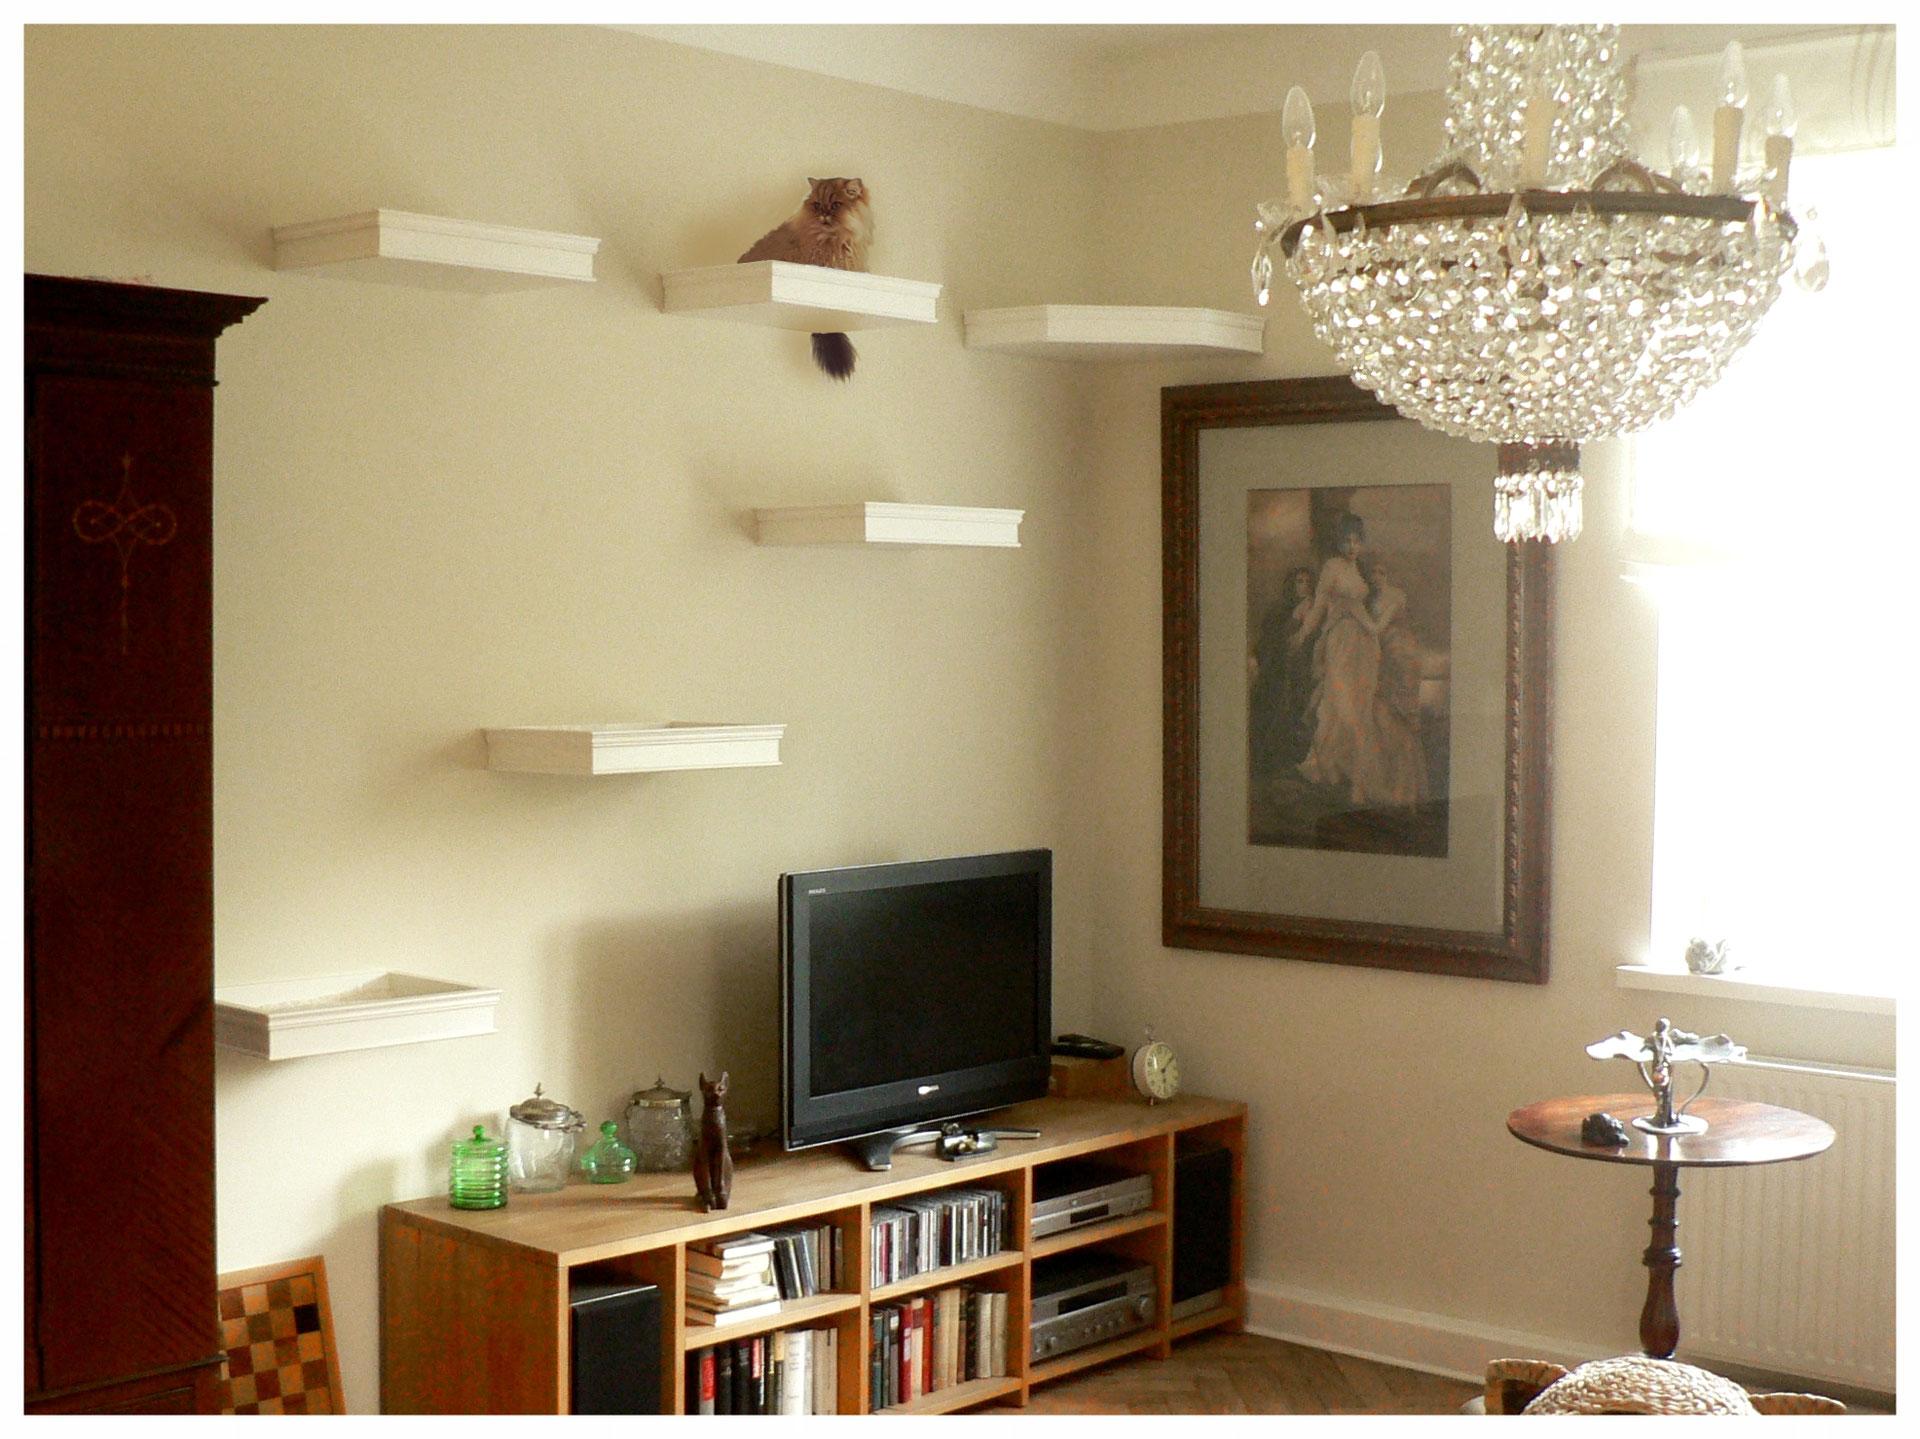 projekt bahrenfeld miezraum raumdesign f r katzenfreunde. Black Bedroom Furniture Sets. Home Design Ideas